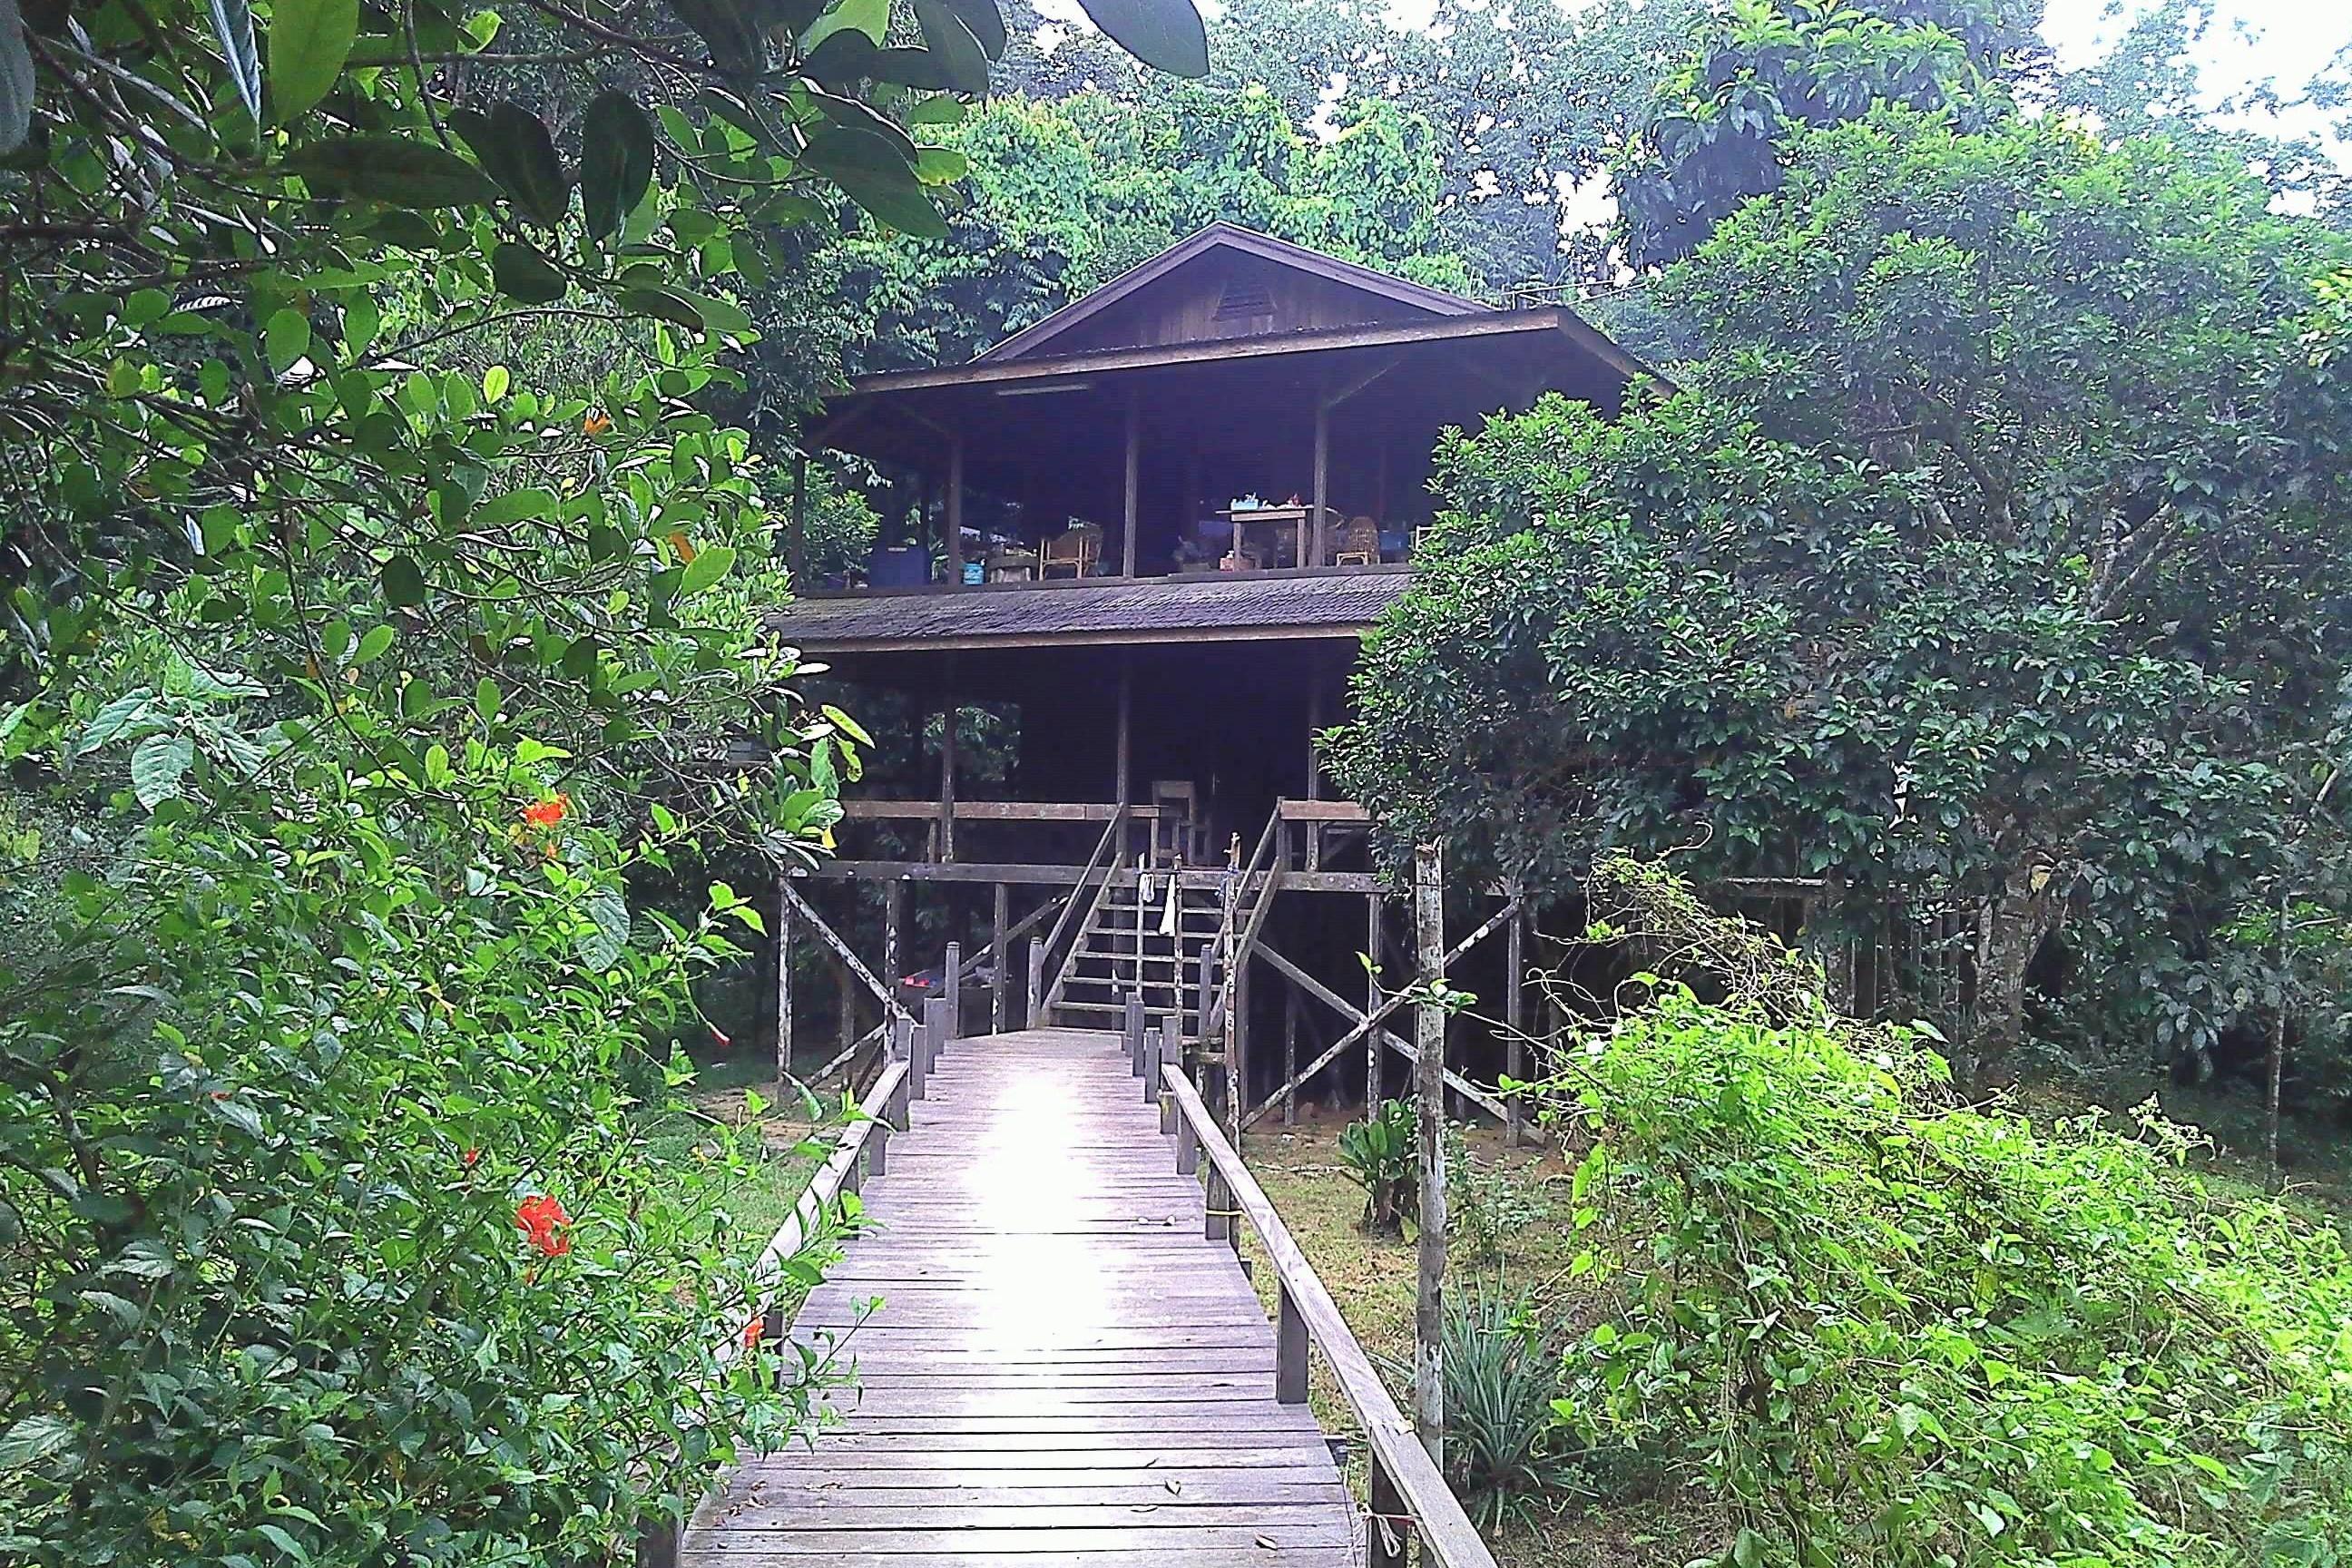 kutai park miau baru dayak village tour guide orangutan safari rain forest borneo